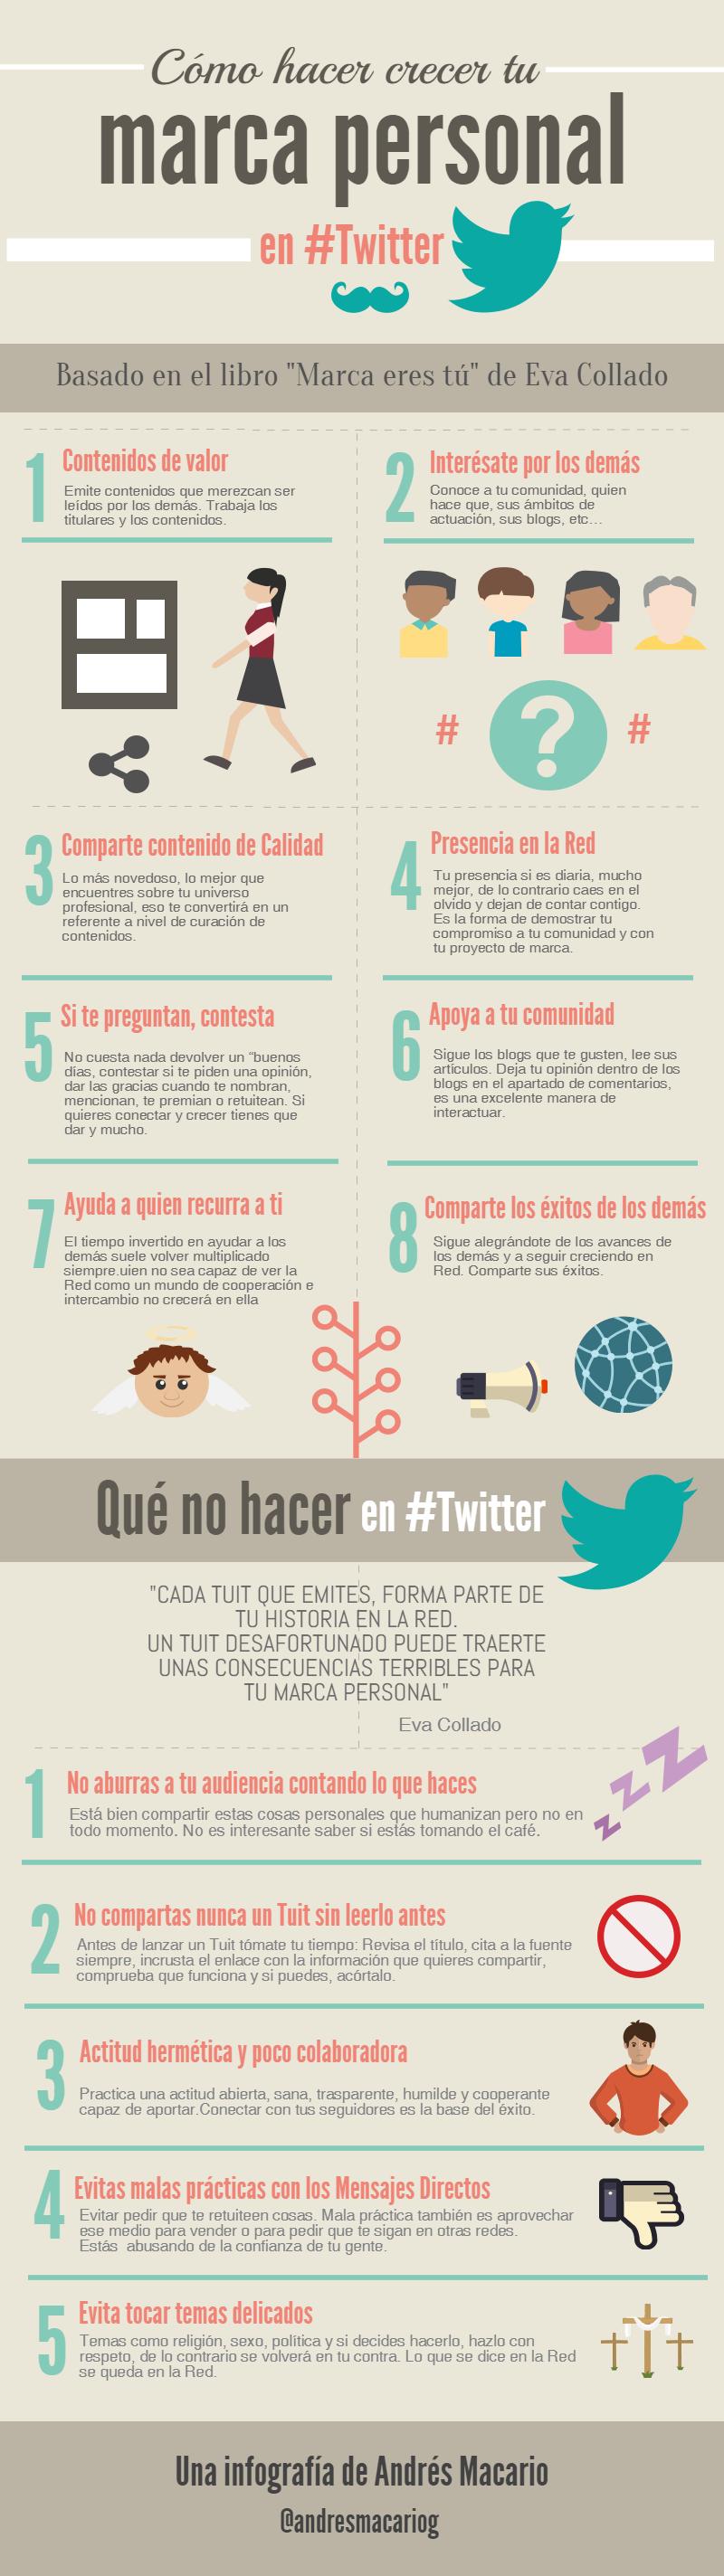 como-hacer-crecer-tu-marca-personal-en-twitter-infografia-andres-macario